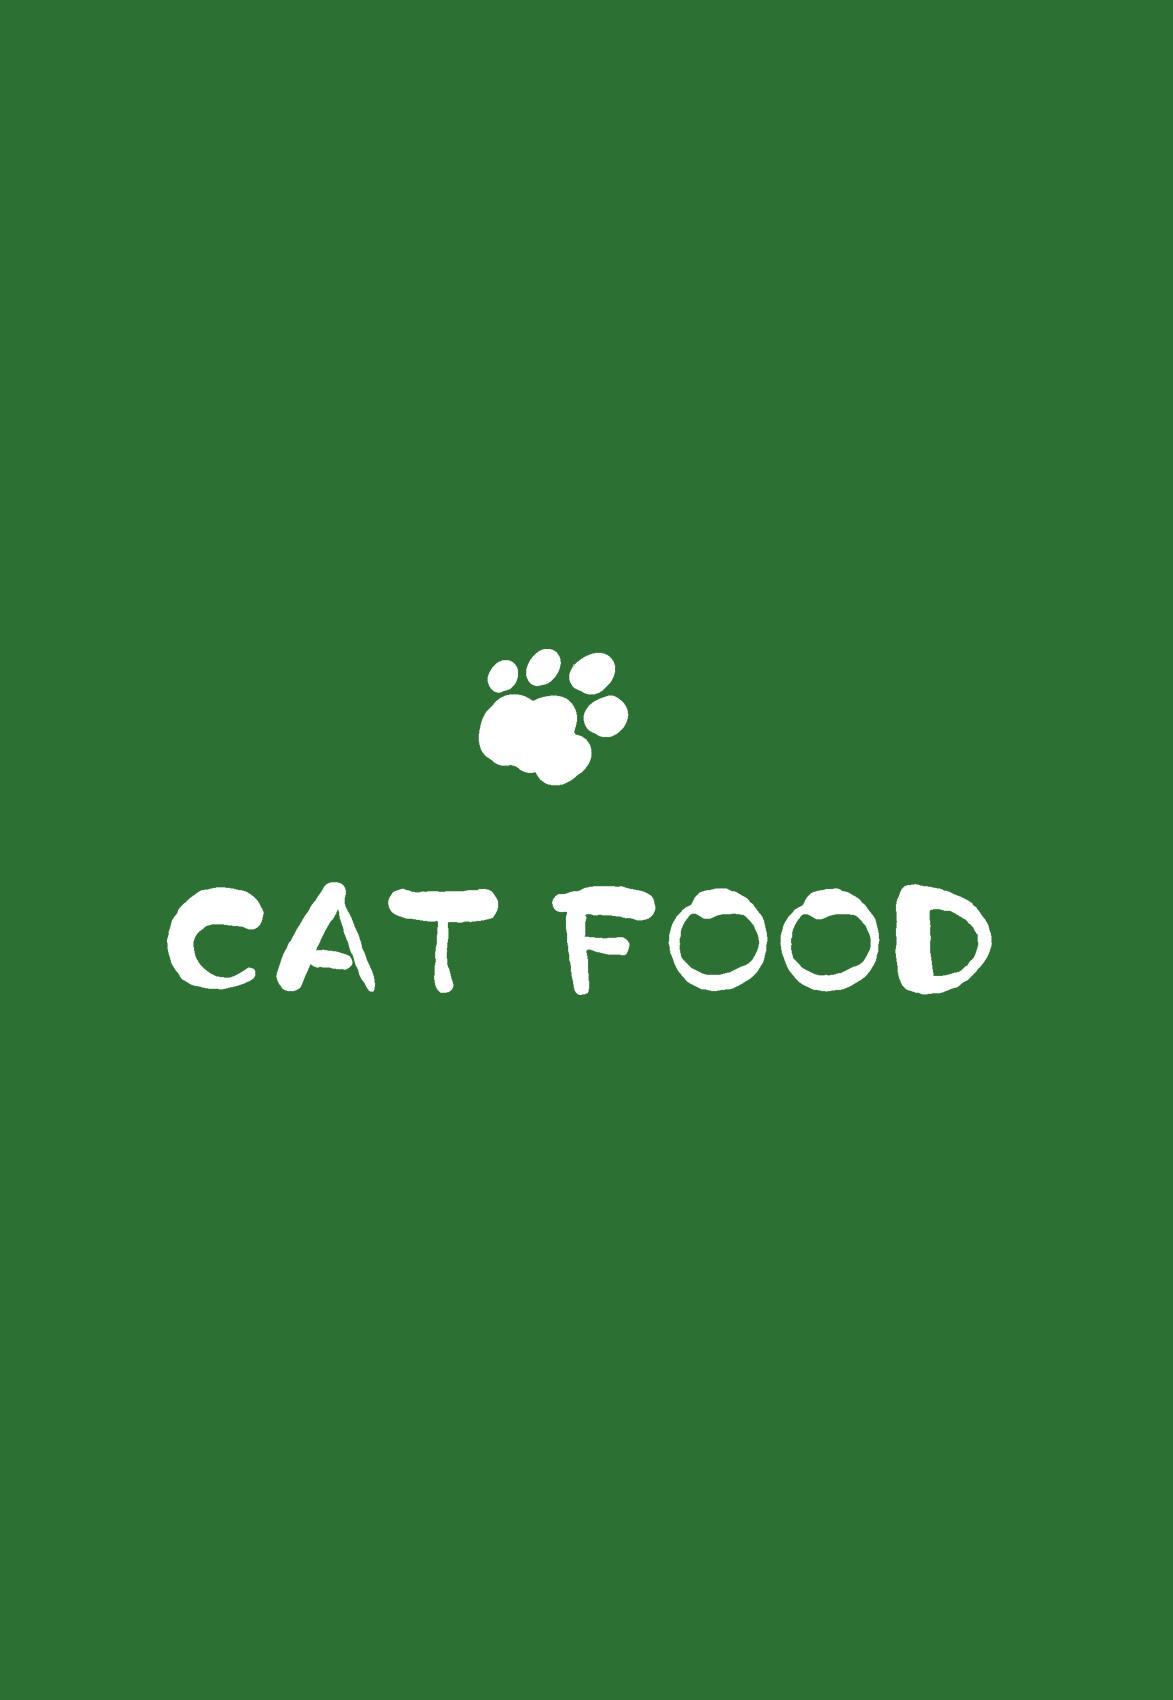 (C91) [Cat FooD (Napata)] Kaede-san-ppoi no! 2 | How Kaede! 2 (THE IDOLM@STER CINDERELLA GIRLS) [English] [Rotoscopic + Nero] 17